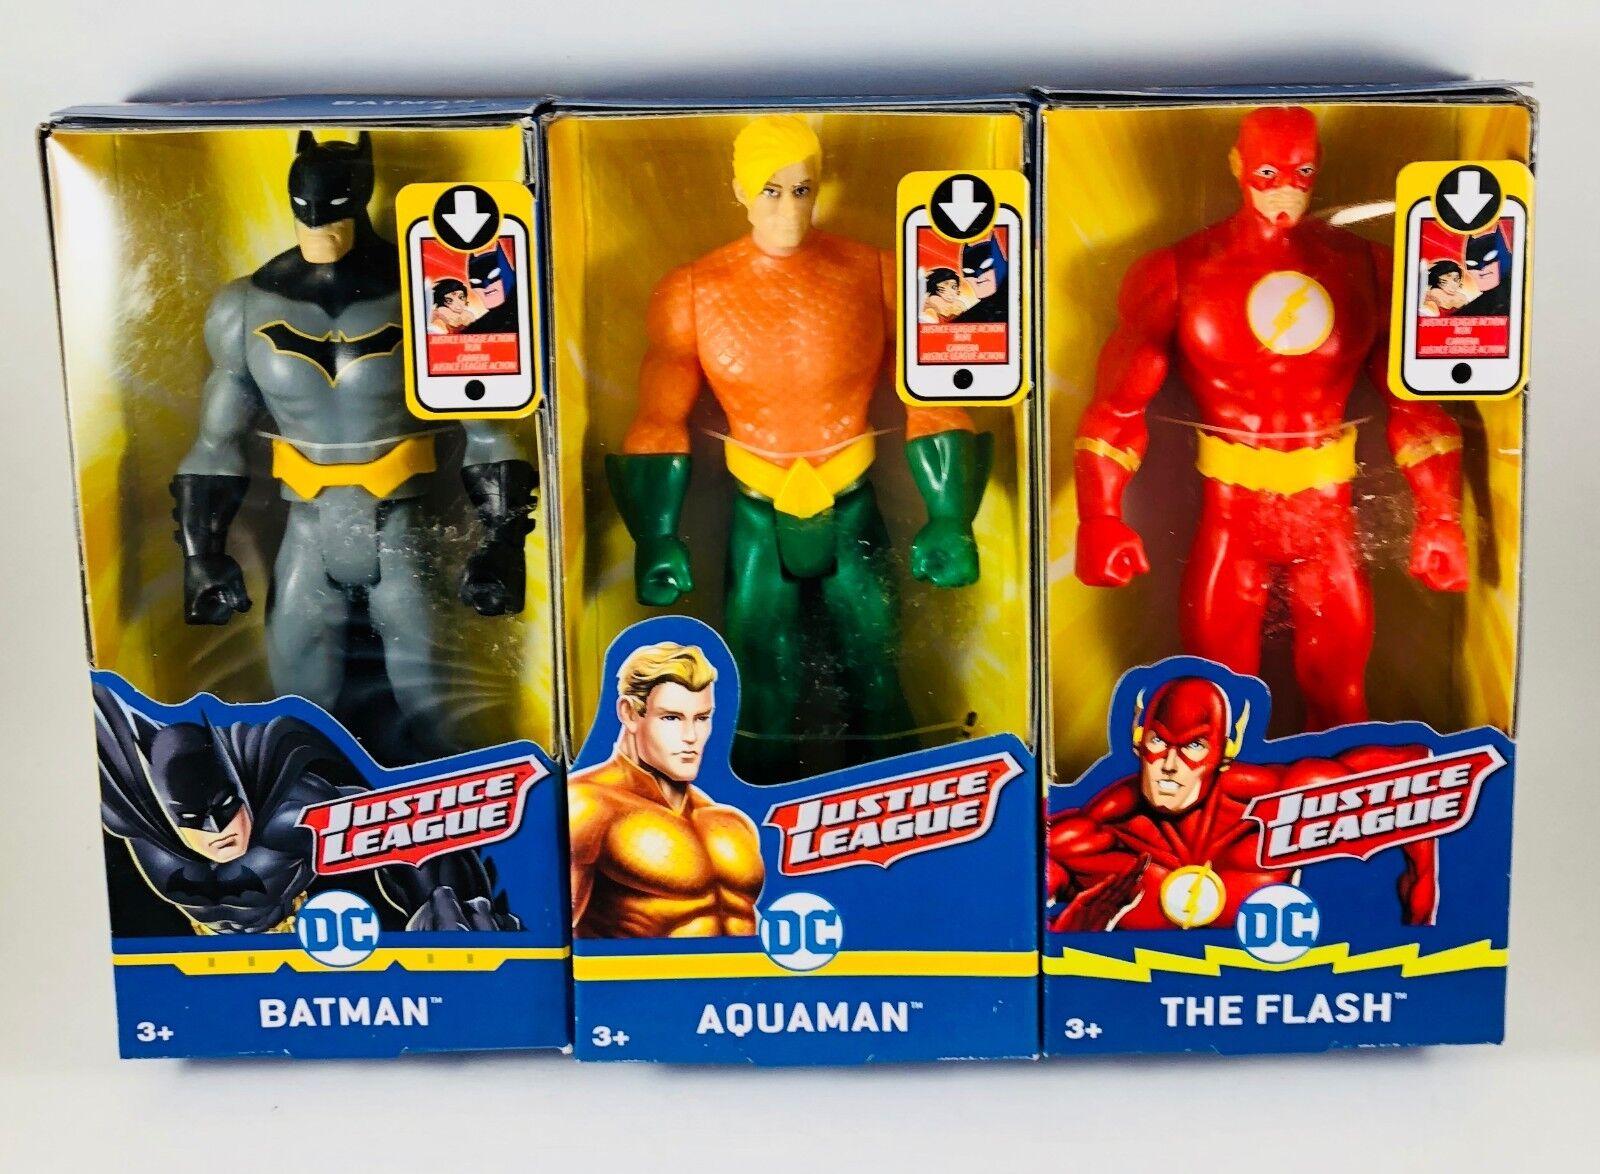 NEW  Mattel DC Justice League Action Batman The Flash Aquaman Figures set of 3